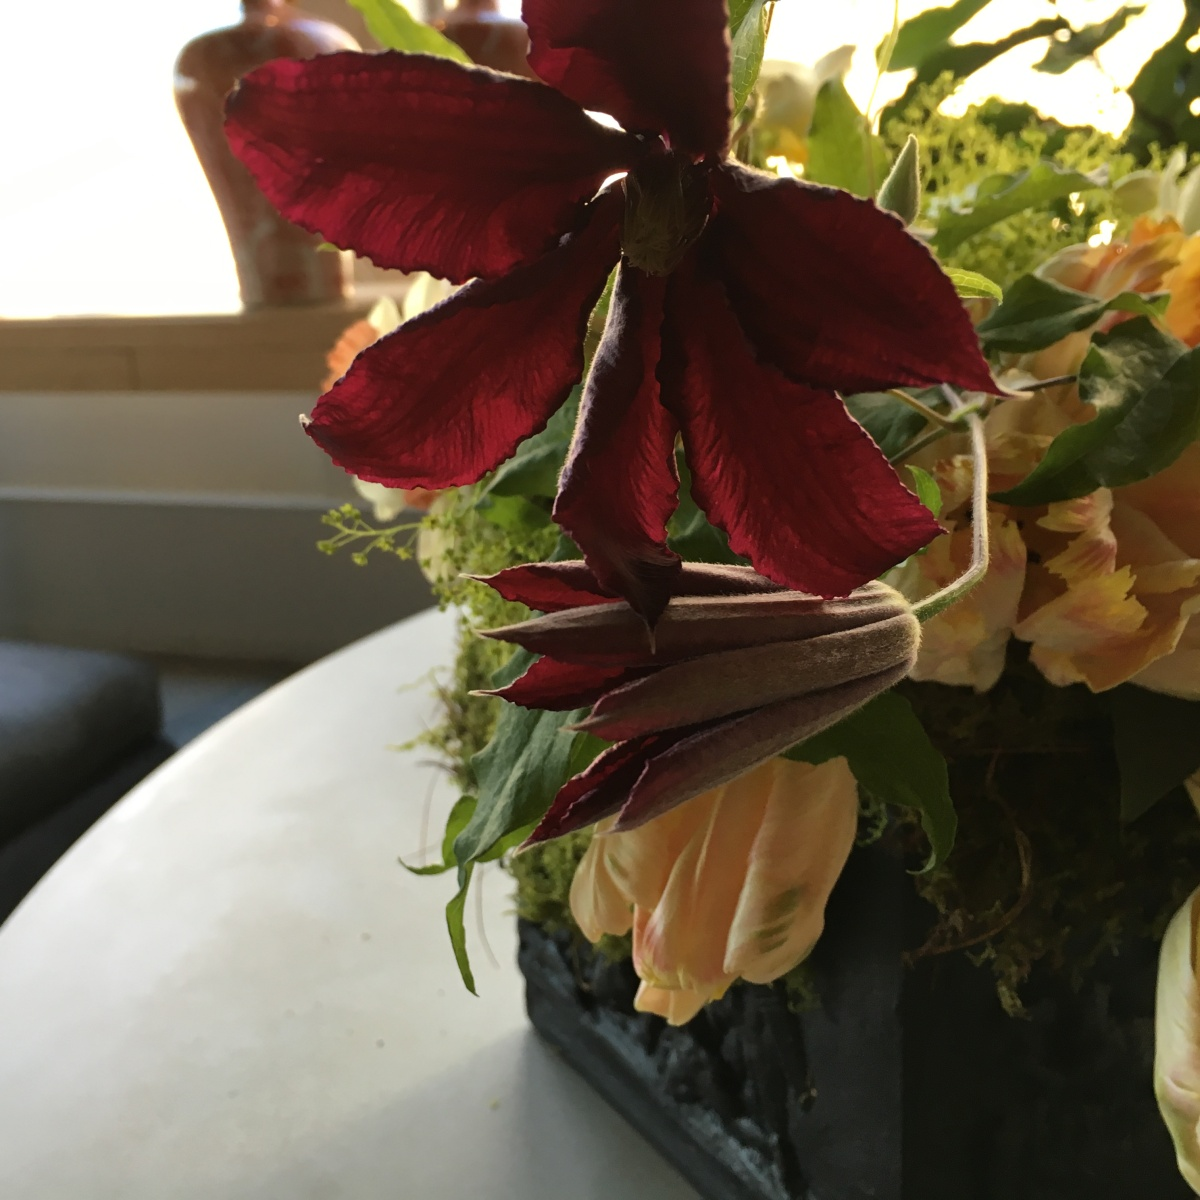 floral-cindye-spring-dinner-party-16